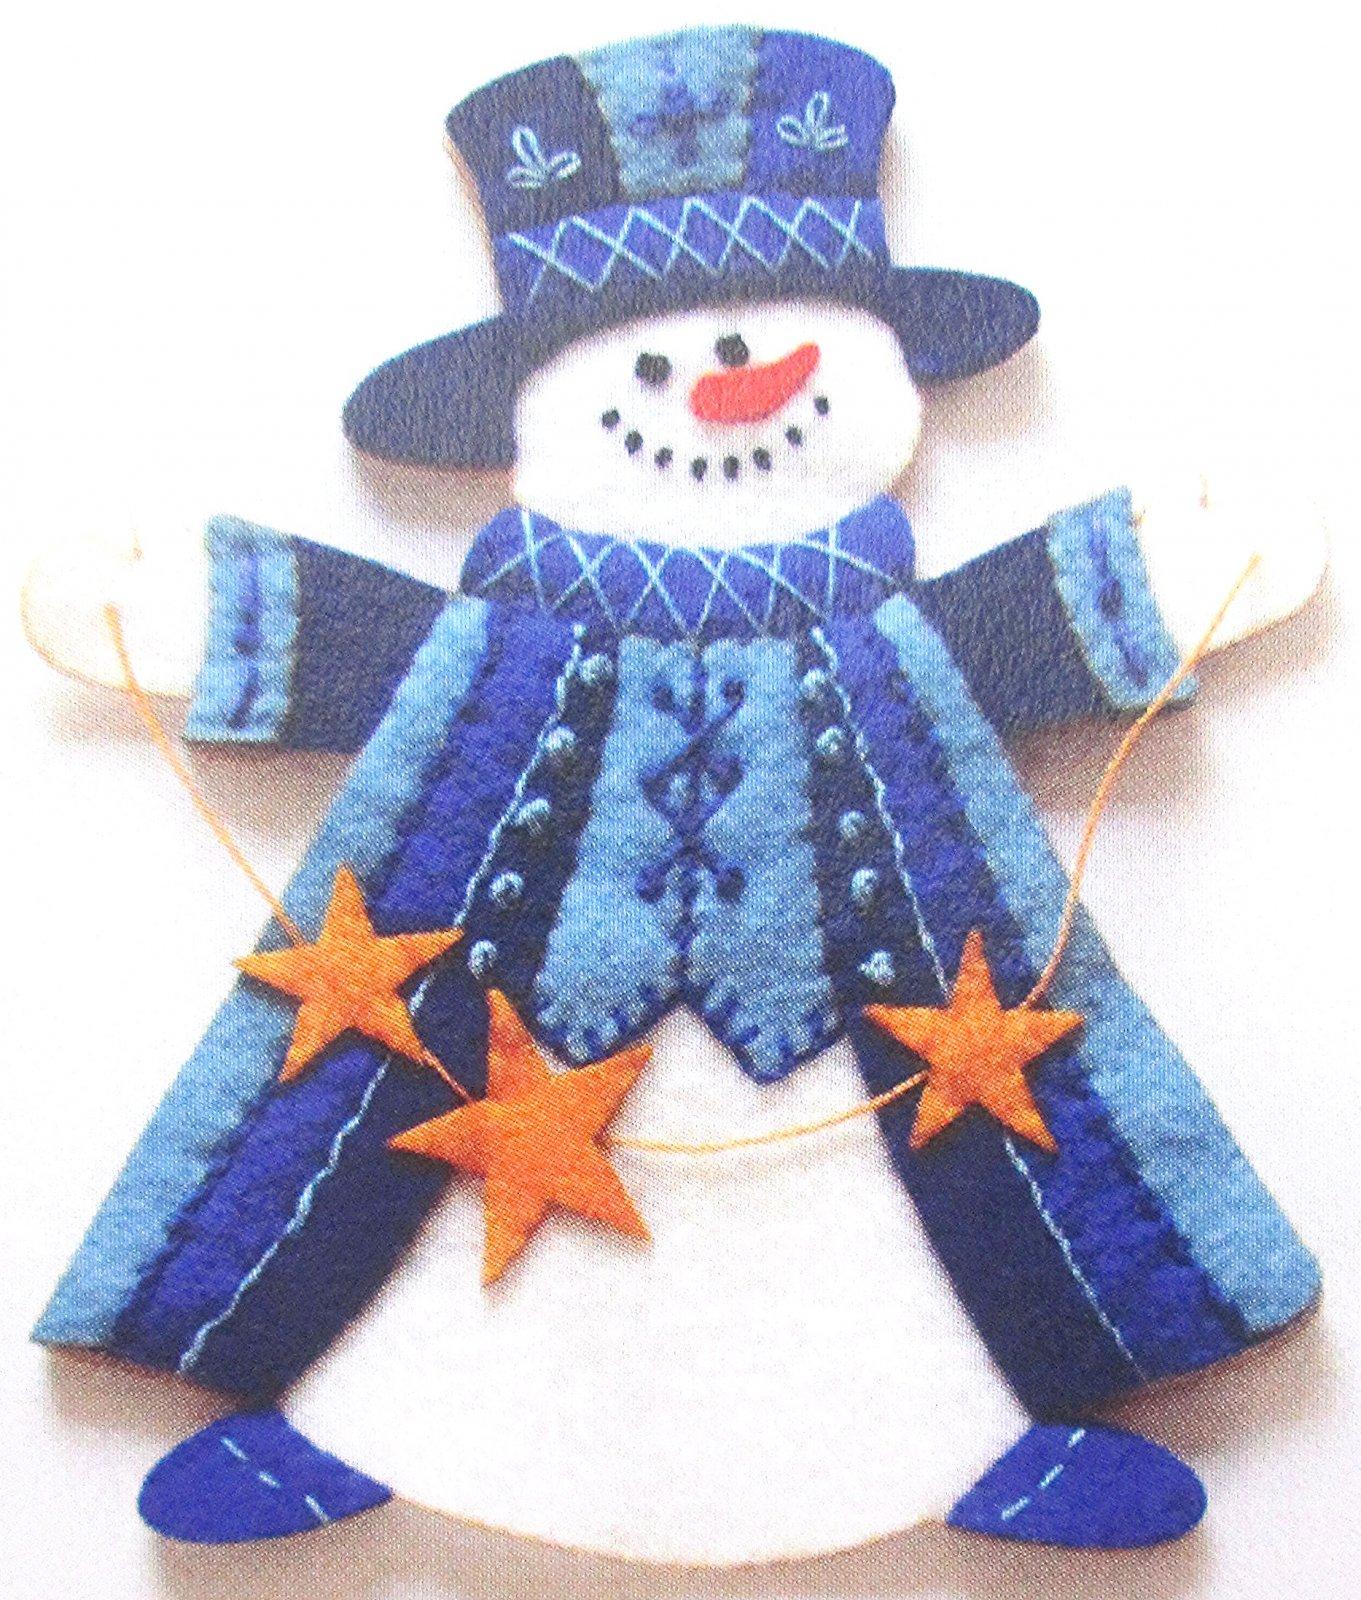 Artsi2 Arthur Snowman Ornament Kit 6.75 x 6